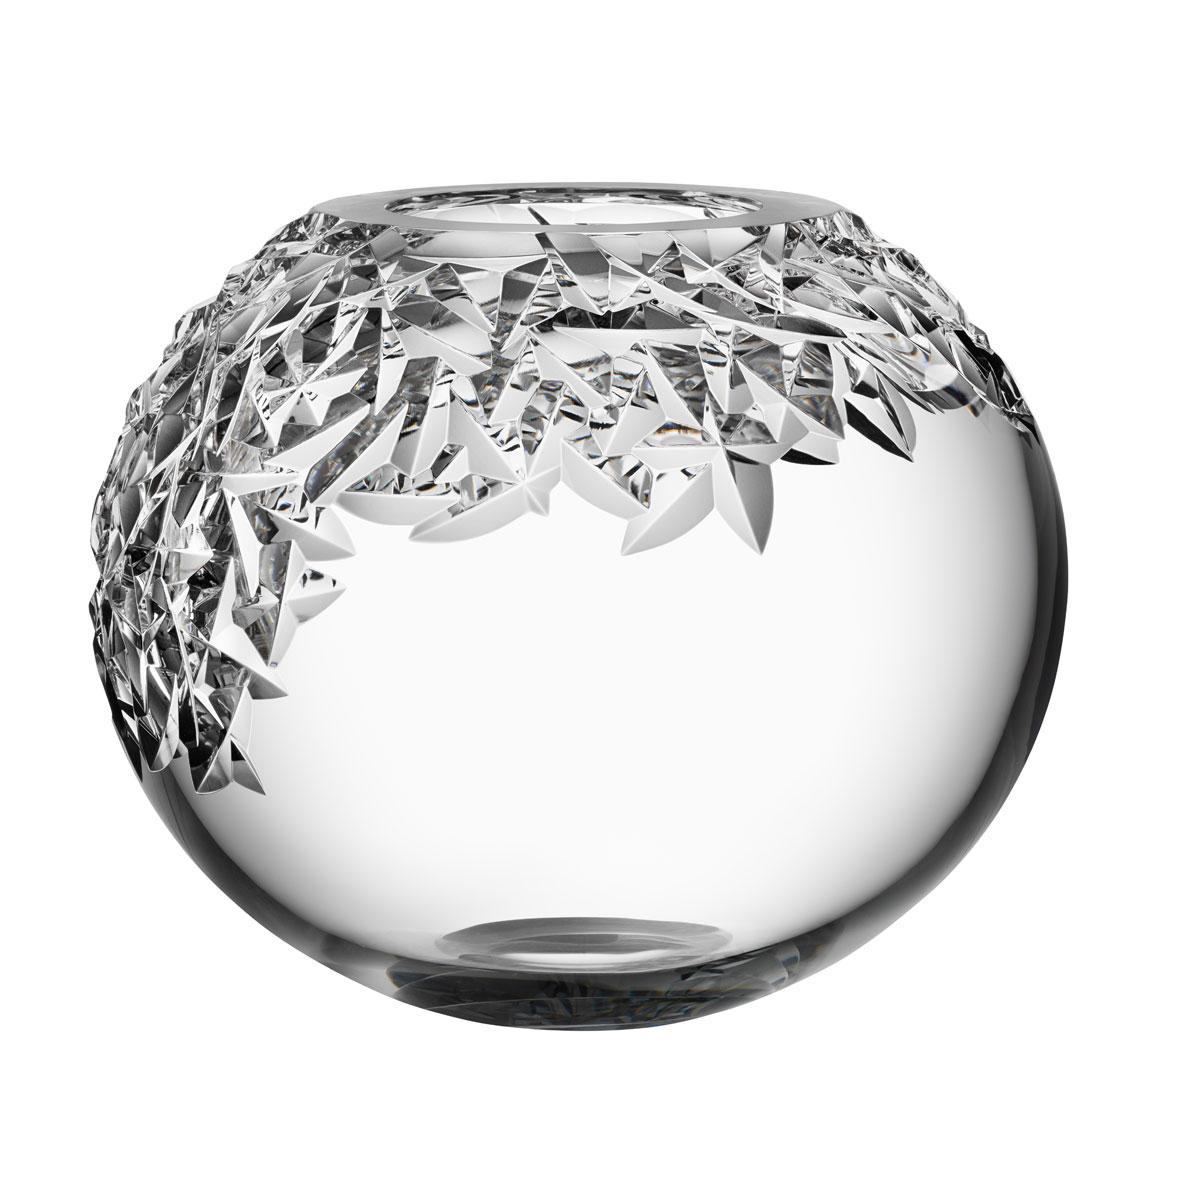 "Orrefors Carat Upper Cut Globe 9.75"" Vase"